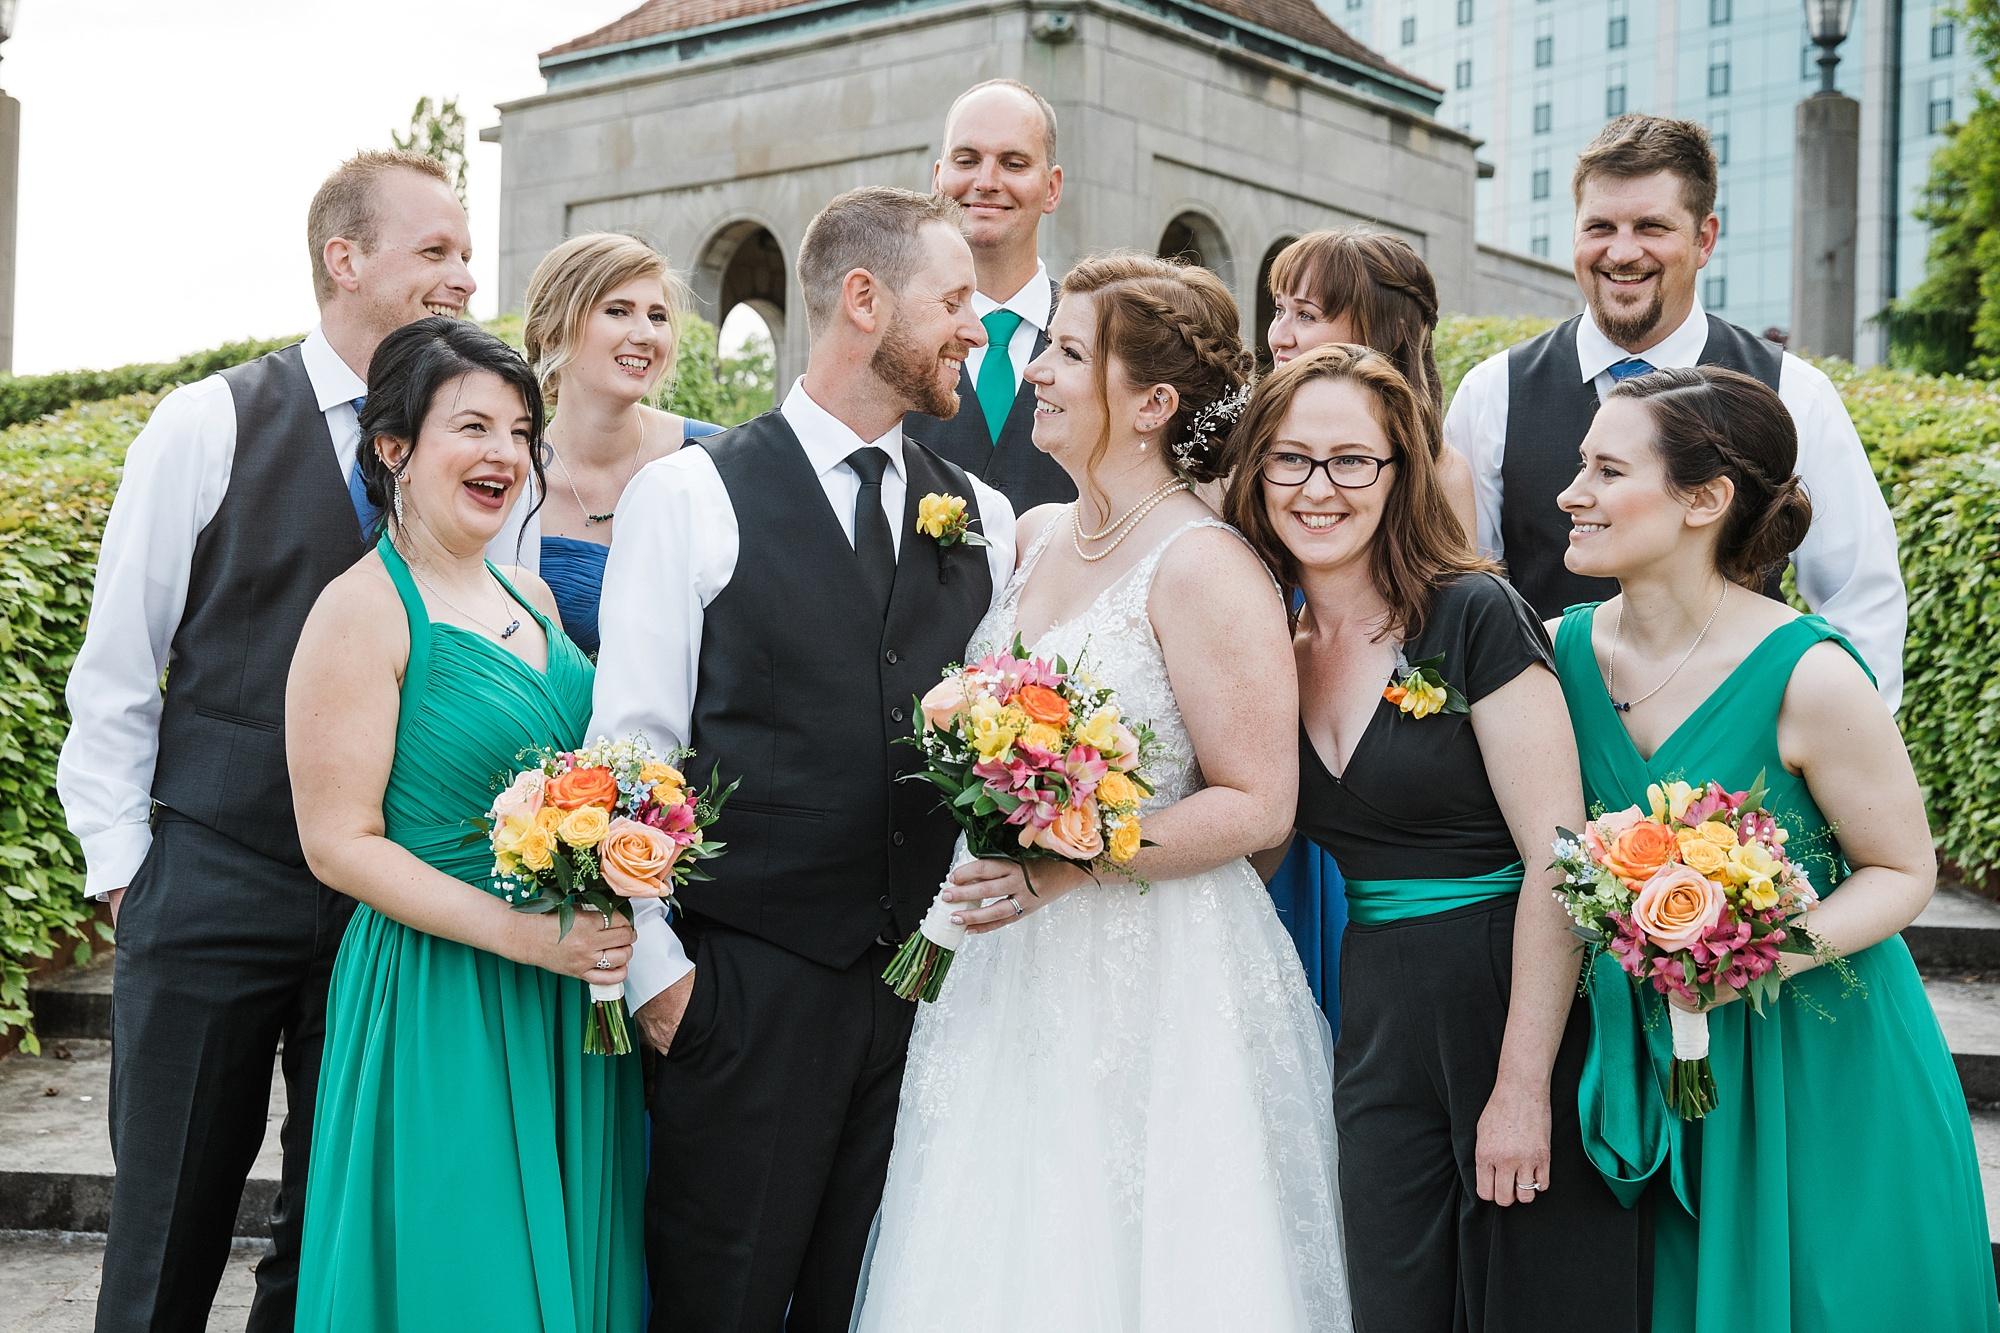 niagarafalls-weddingphotography_0047.jpg